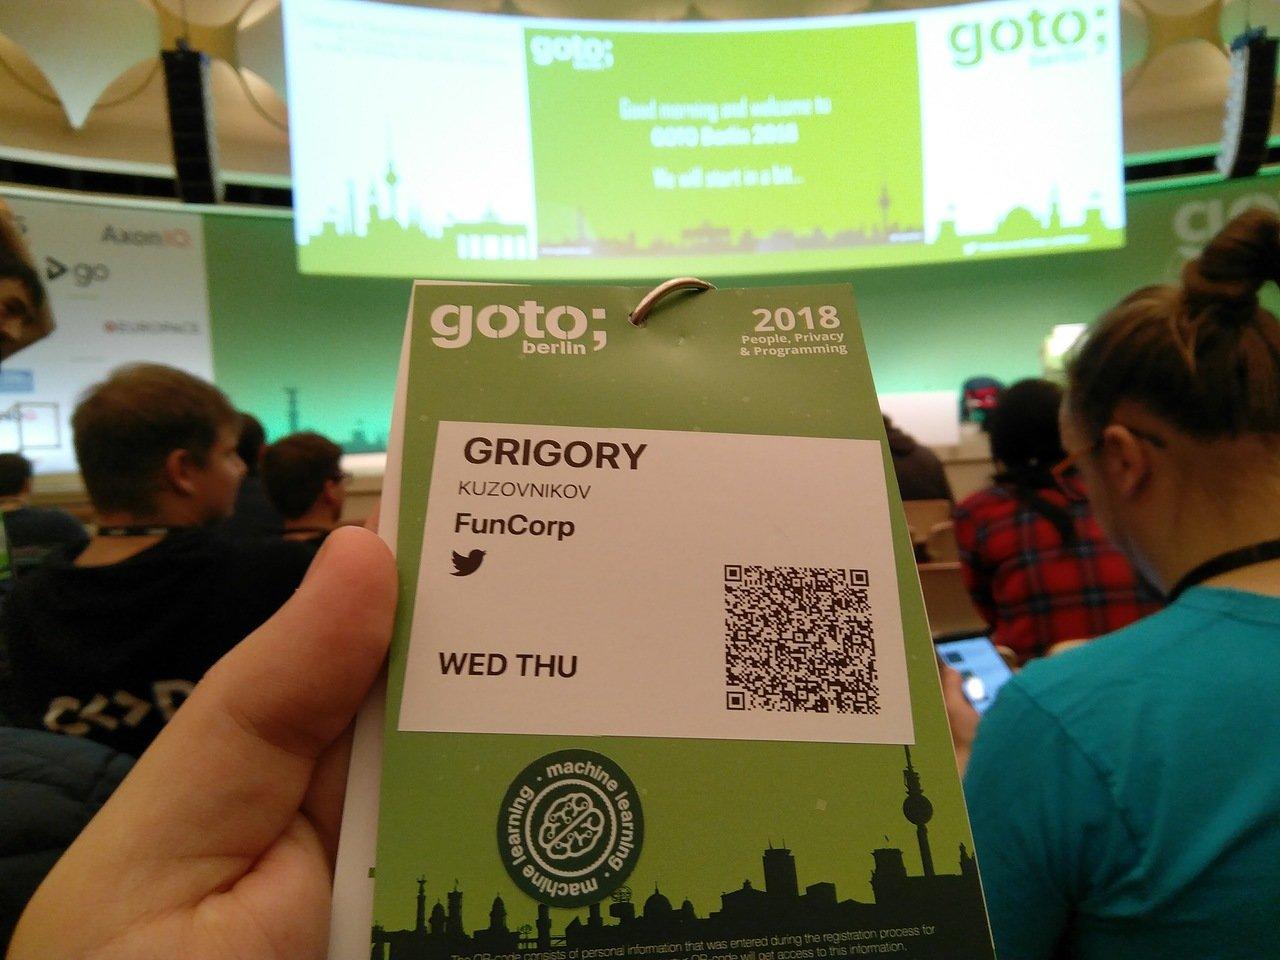 Go to GOTO - 4